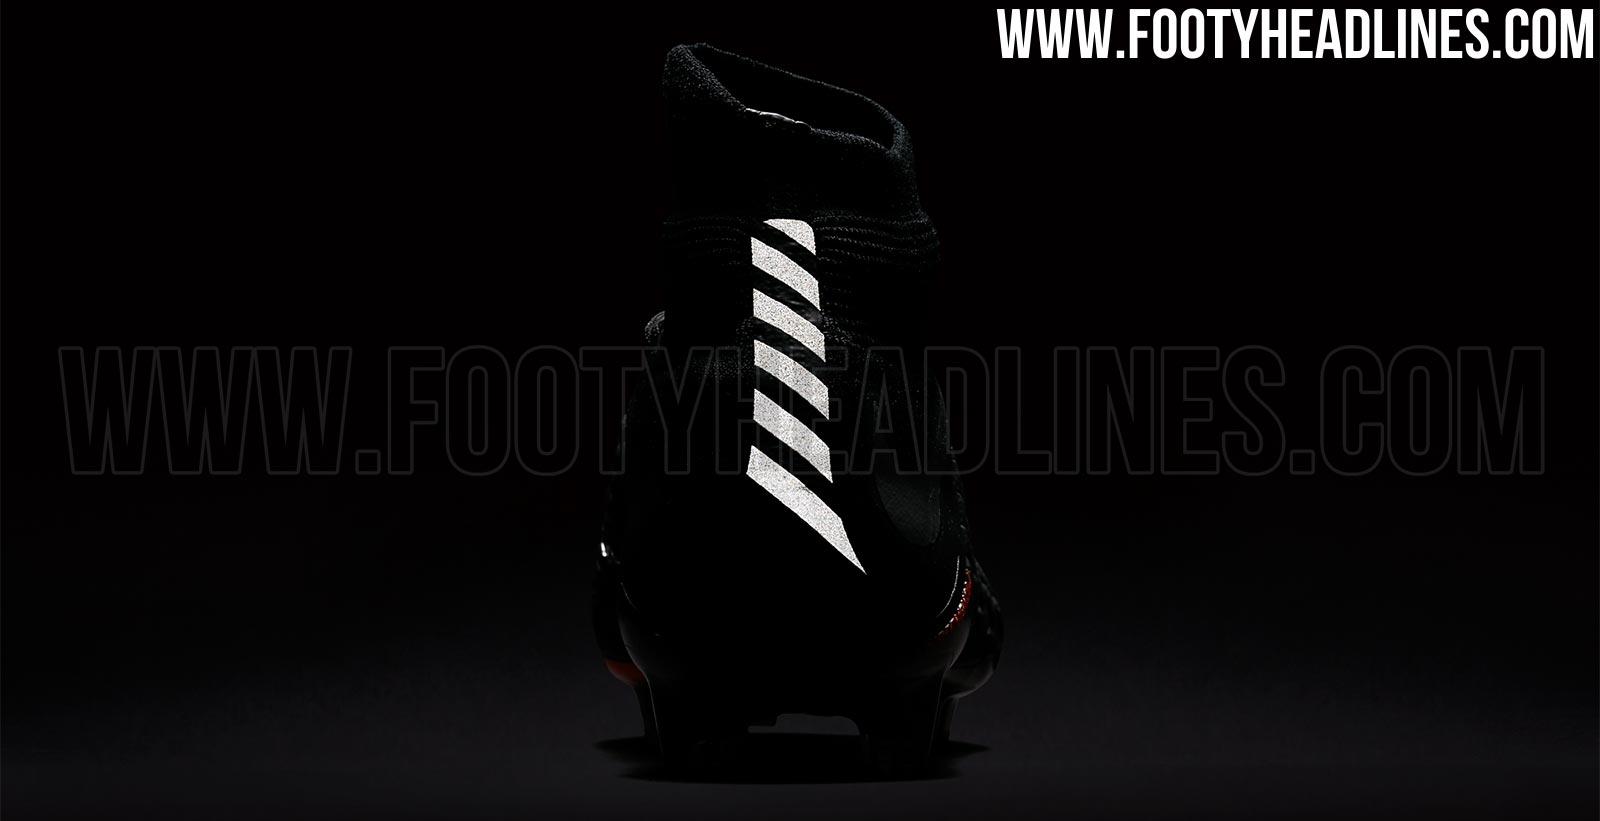 Awesome Black Nike Hypervenom Phantom III Strike Night 2017 Boots Released